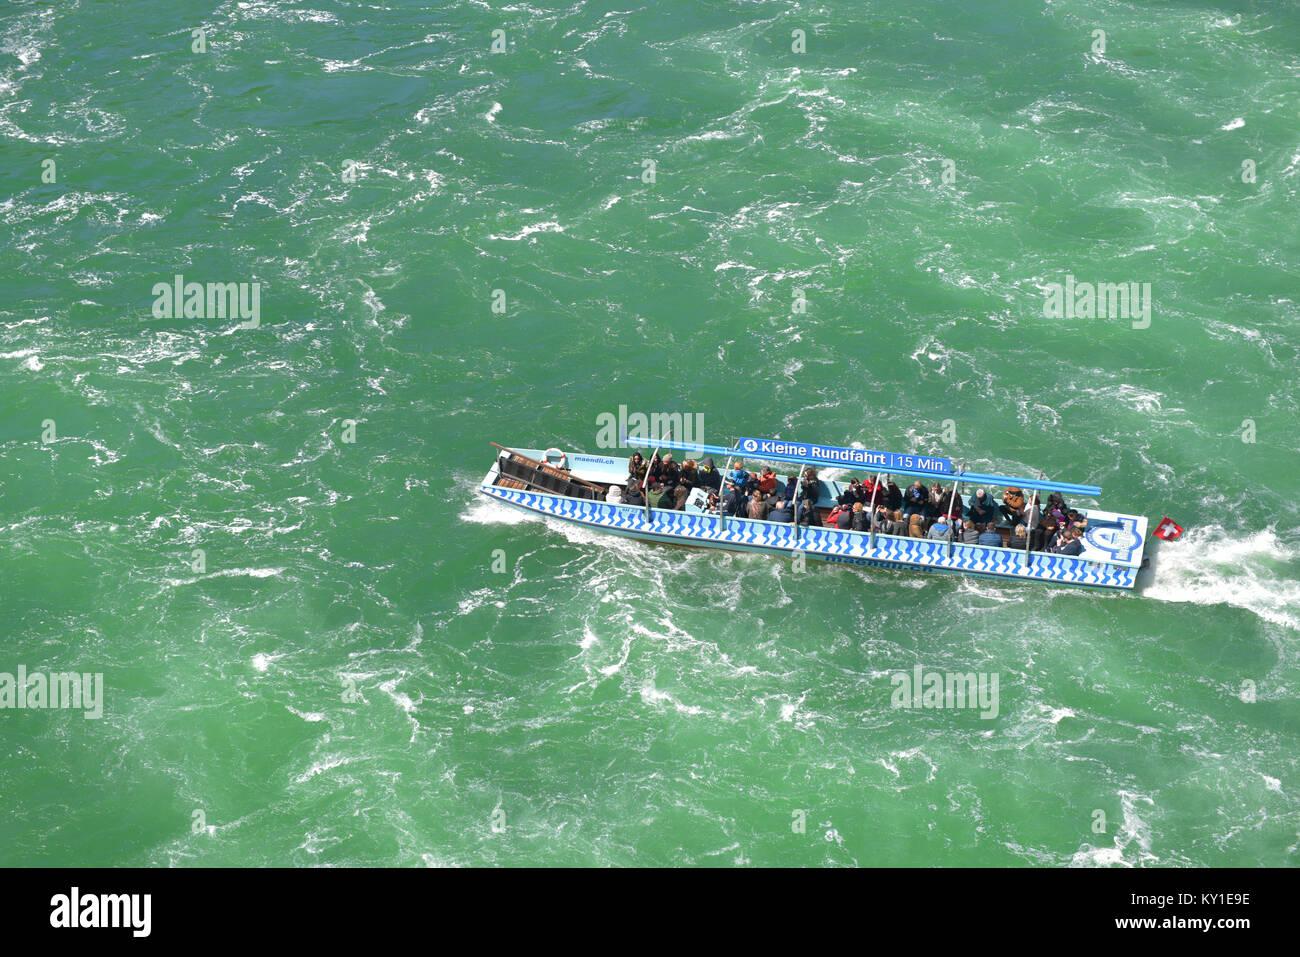 Touristic boat at Rhein waterfall. Germany - Stock Image